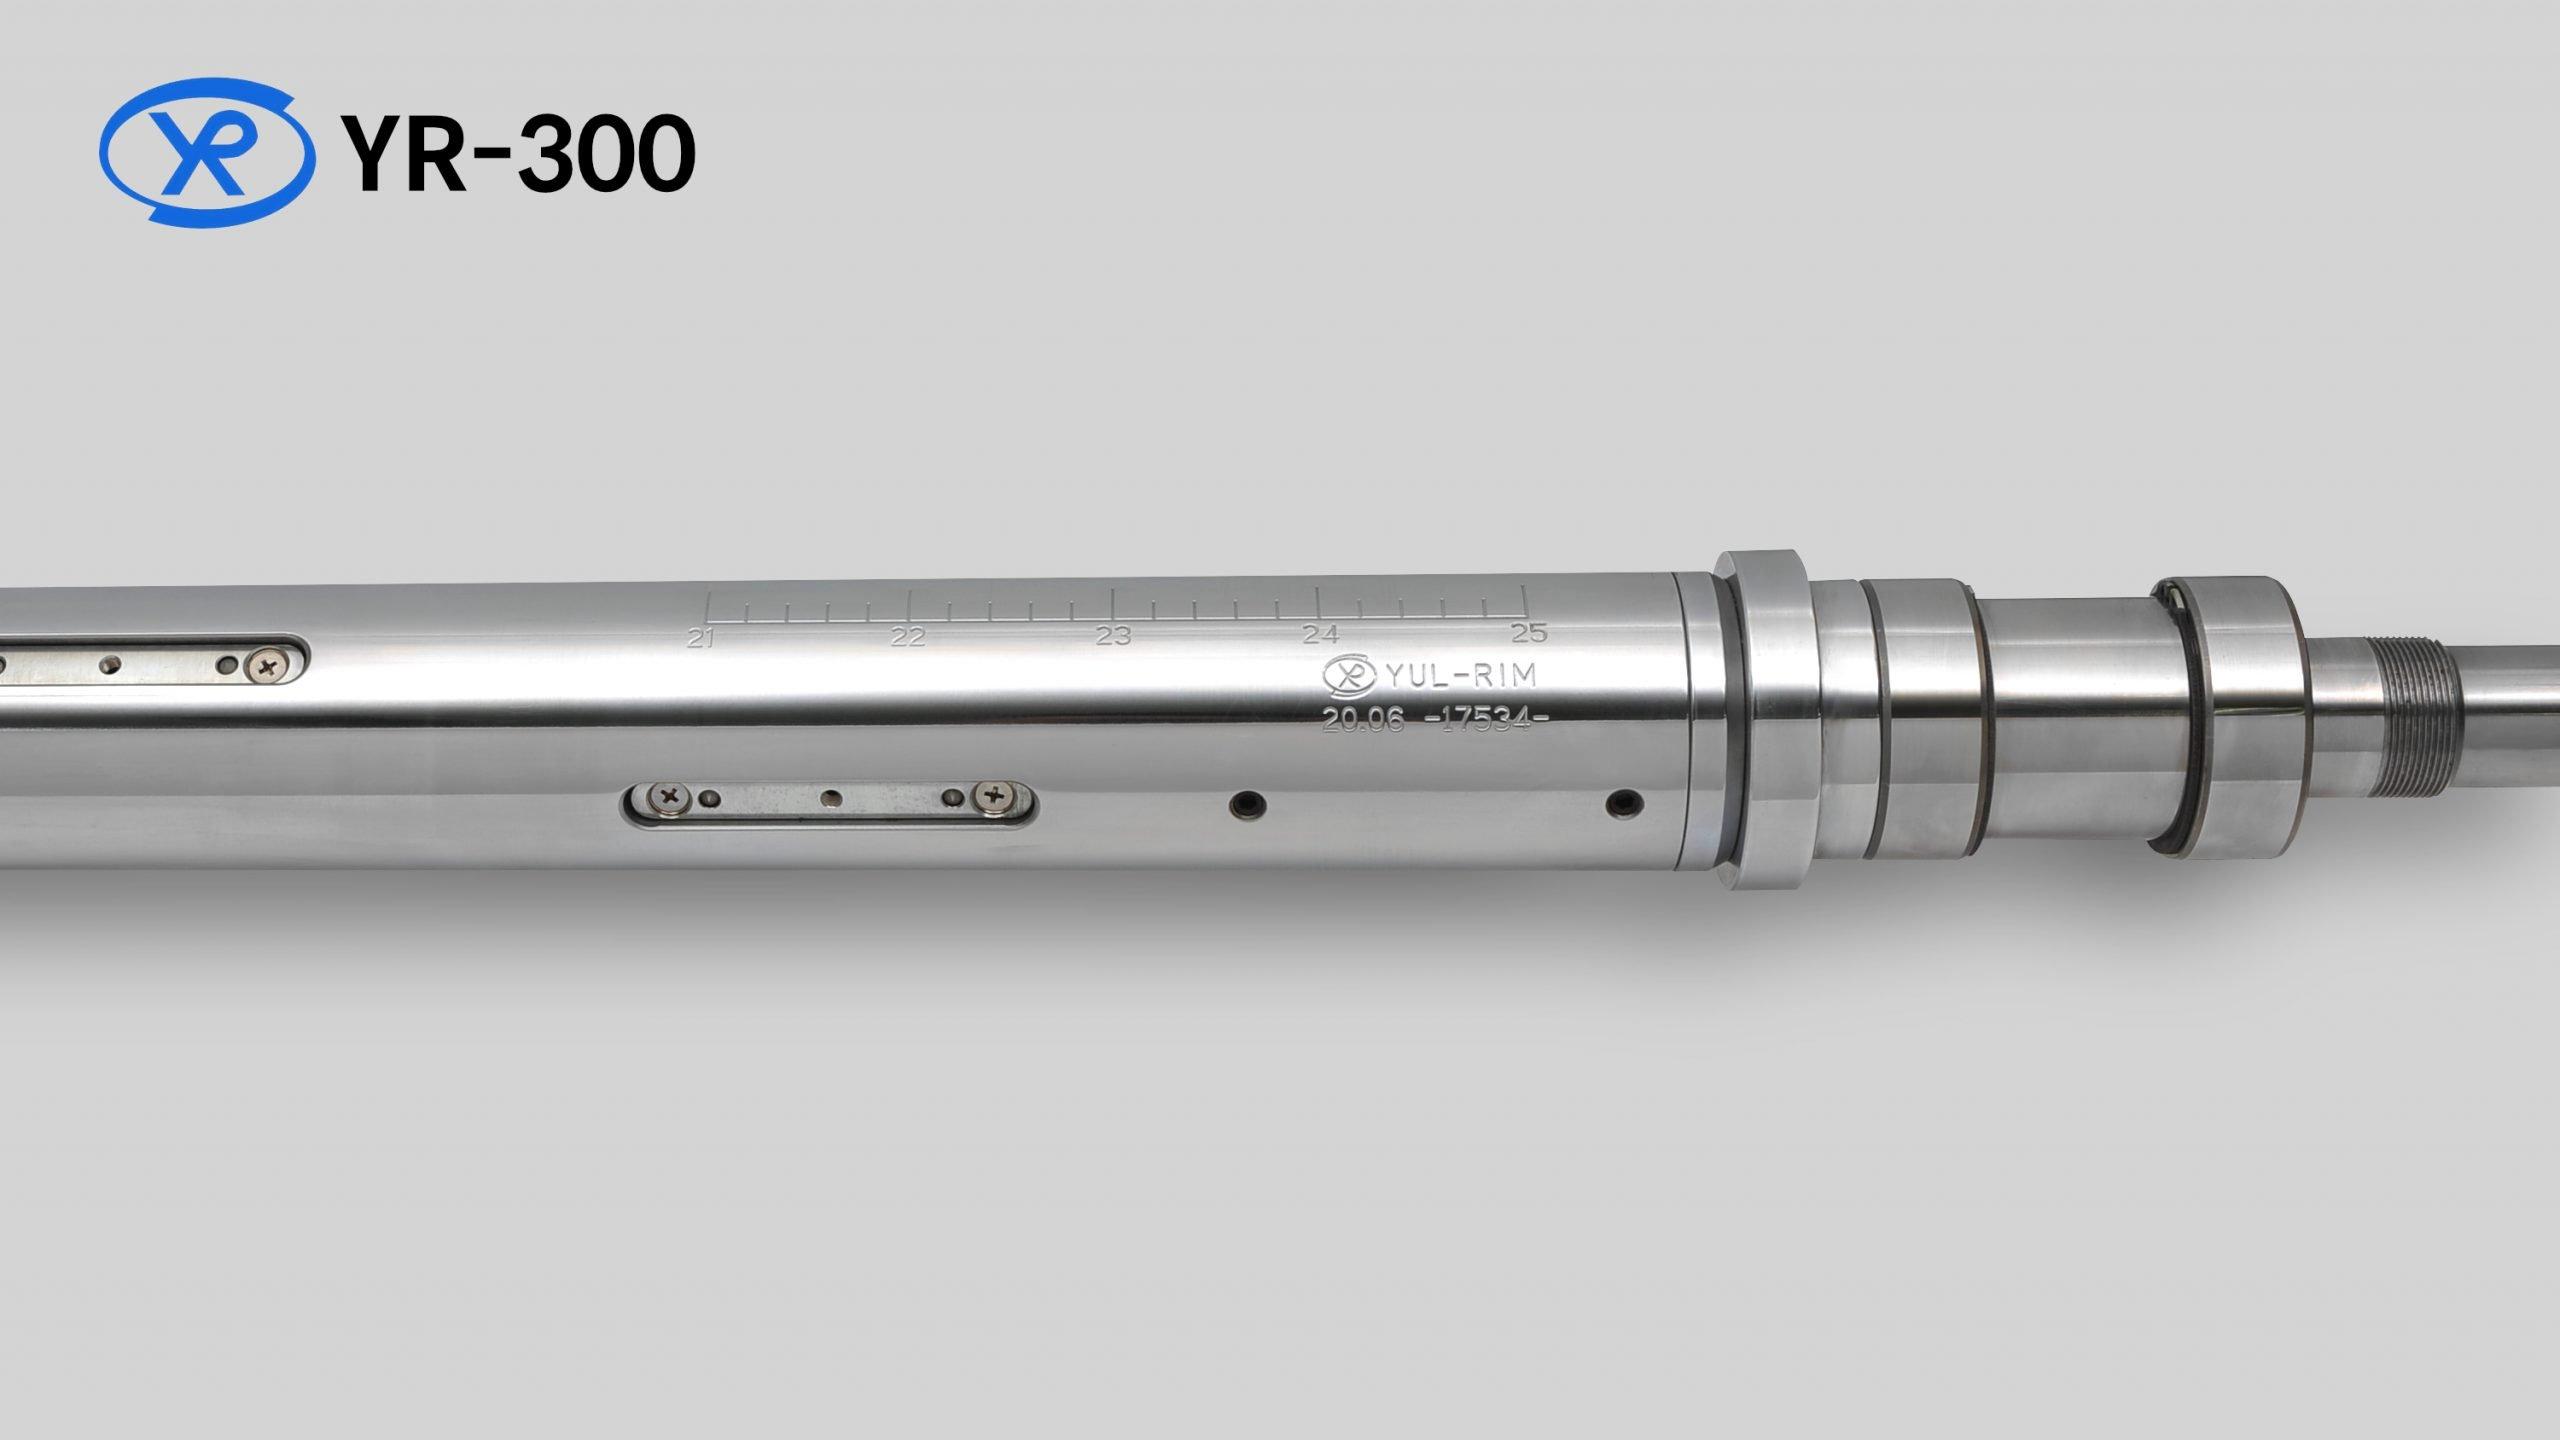 YR-300